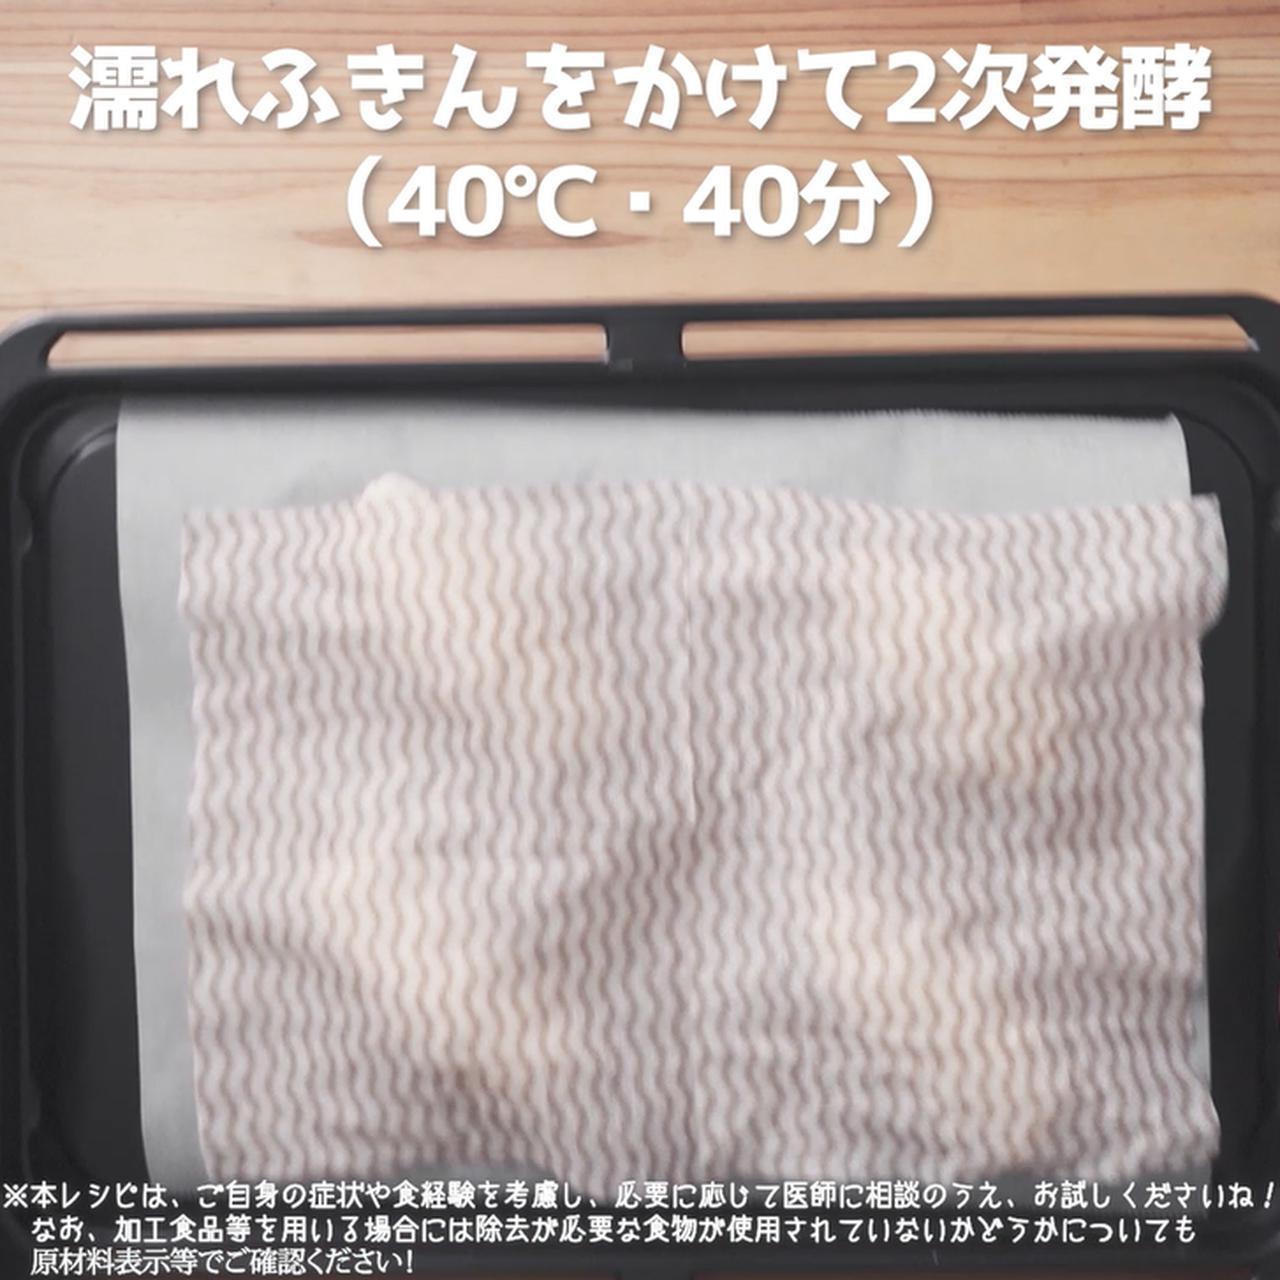 画像: d1uzk9o9cg136f.cloudfront.net